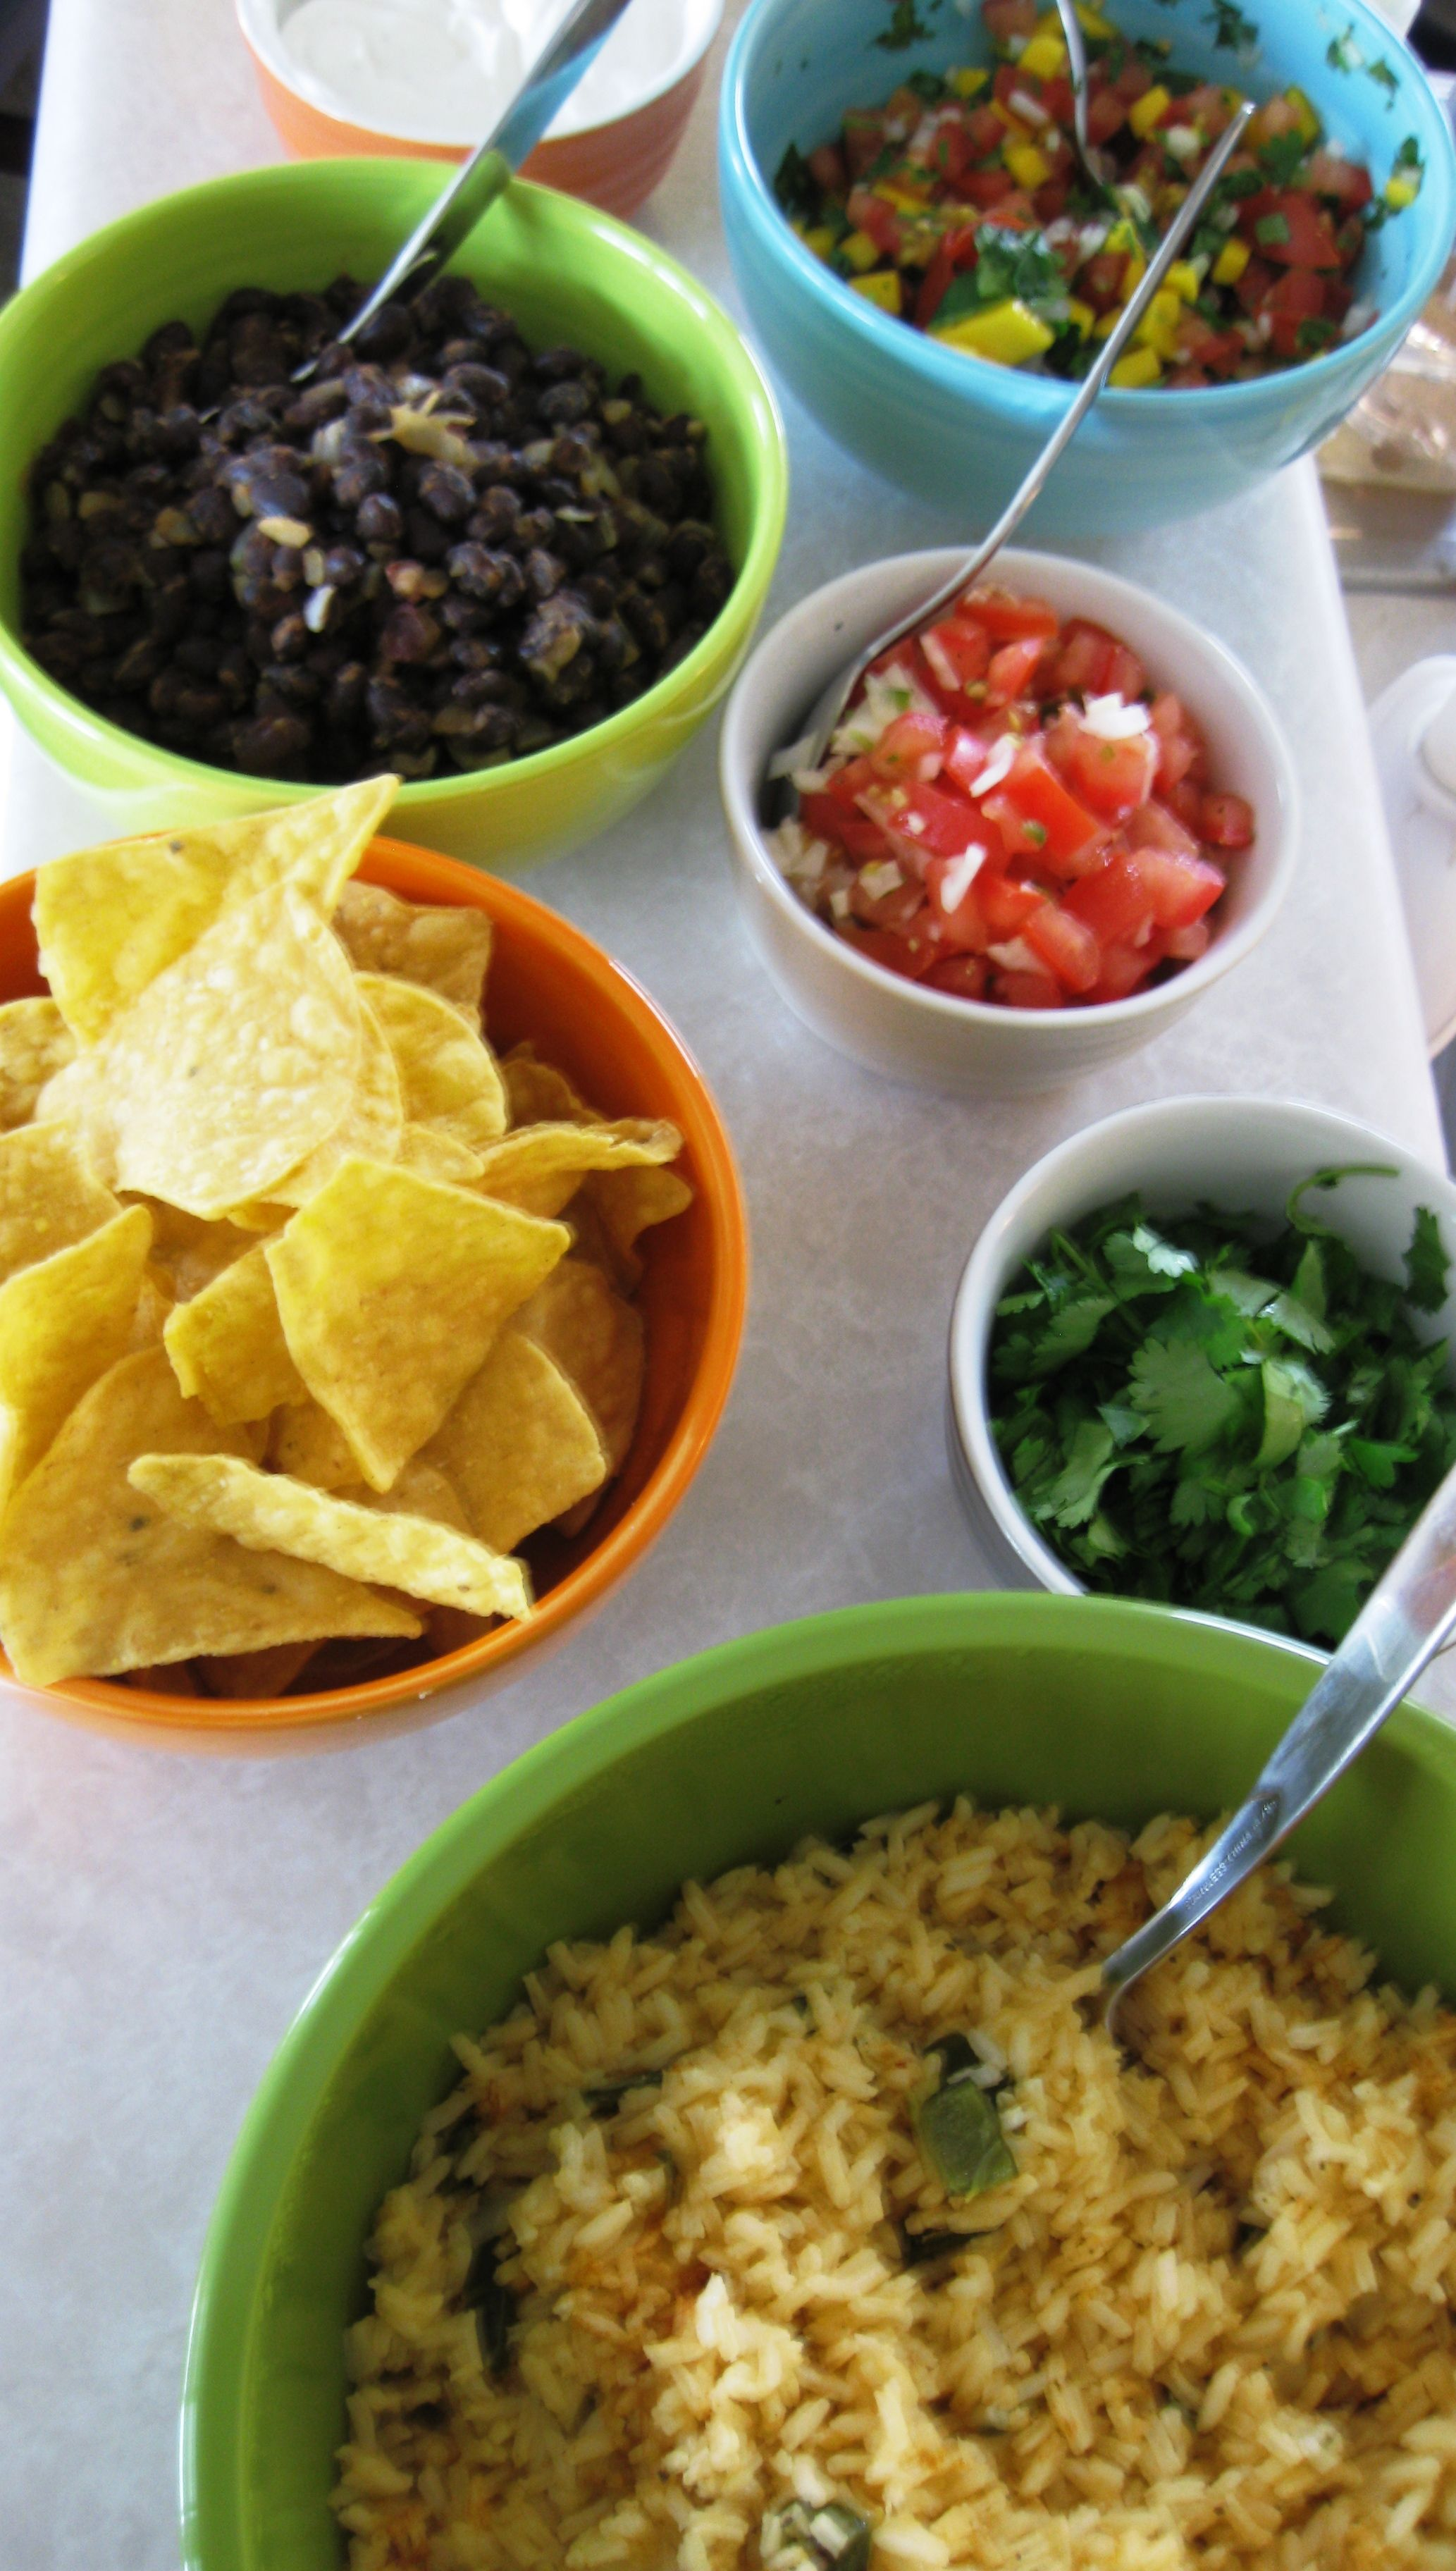 Mexican Fiesta Party for Cinco de Mayo: Mango Pico de Gallo, Guacamole, Spanish Rice, Black Beans